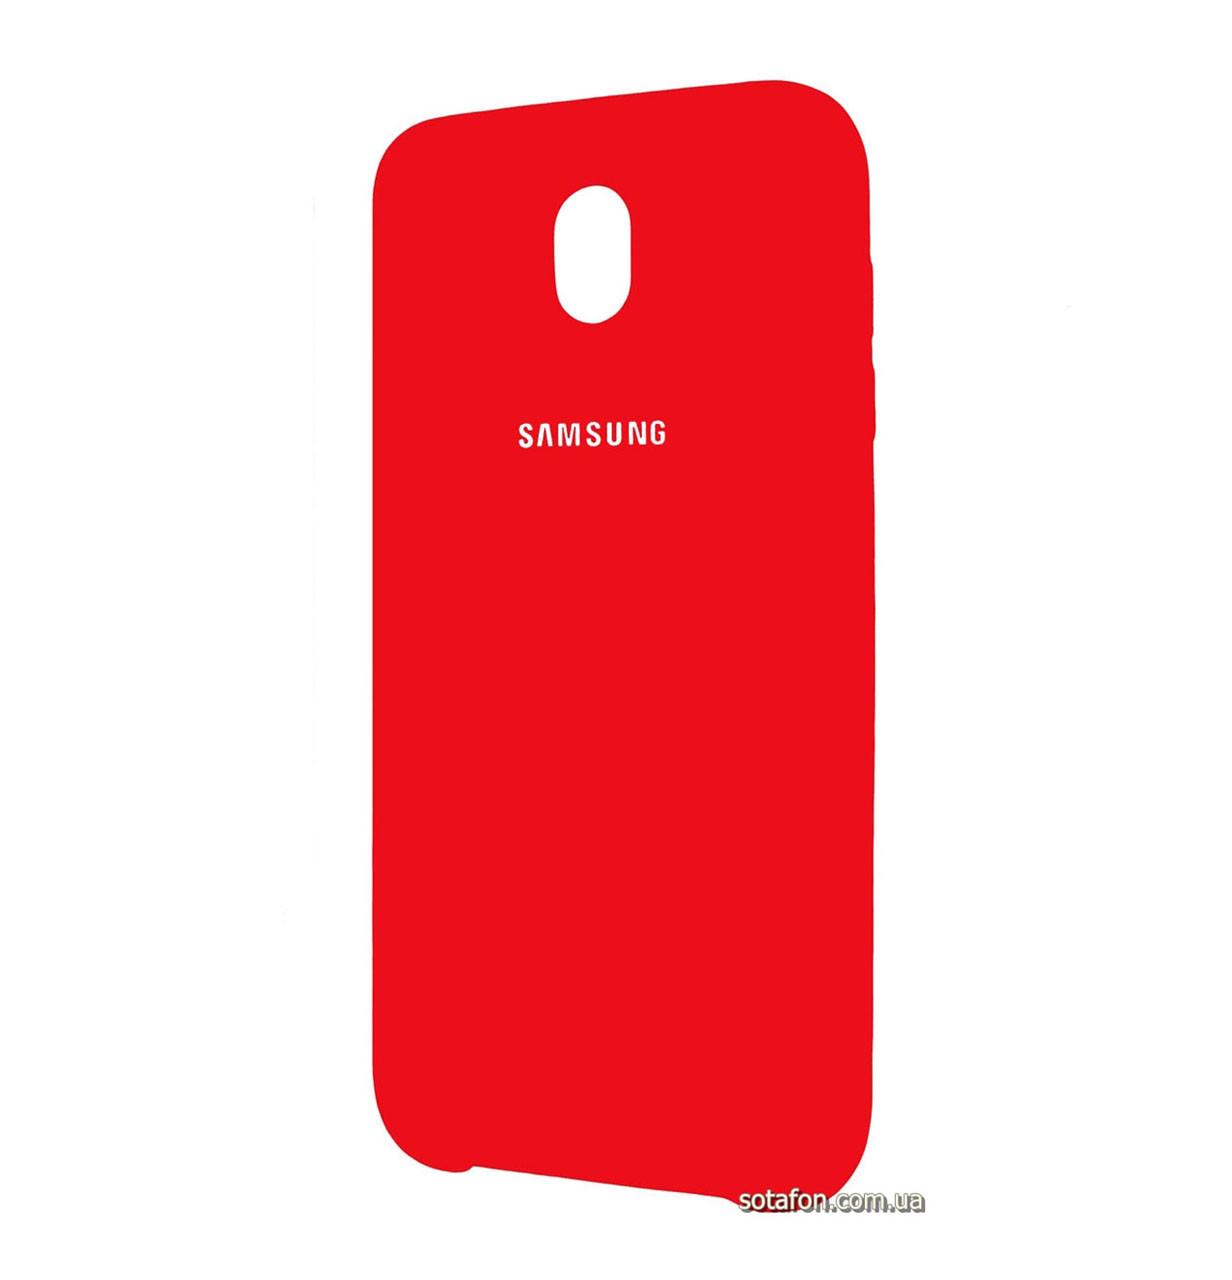 Чехол-накладка Original Silicone case на Samsung Galaxy J3 (2017) SM-J330F Red